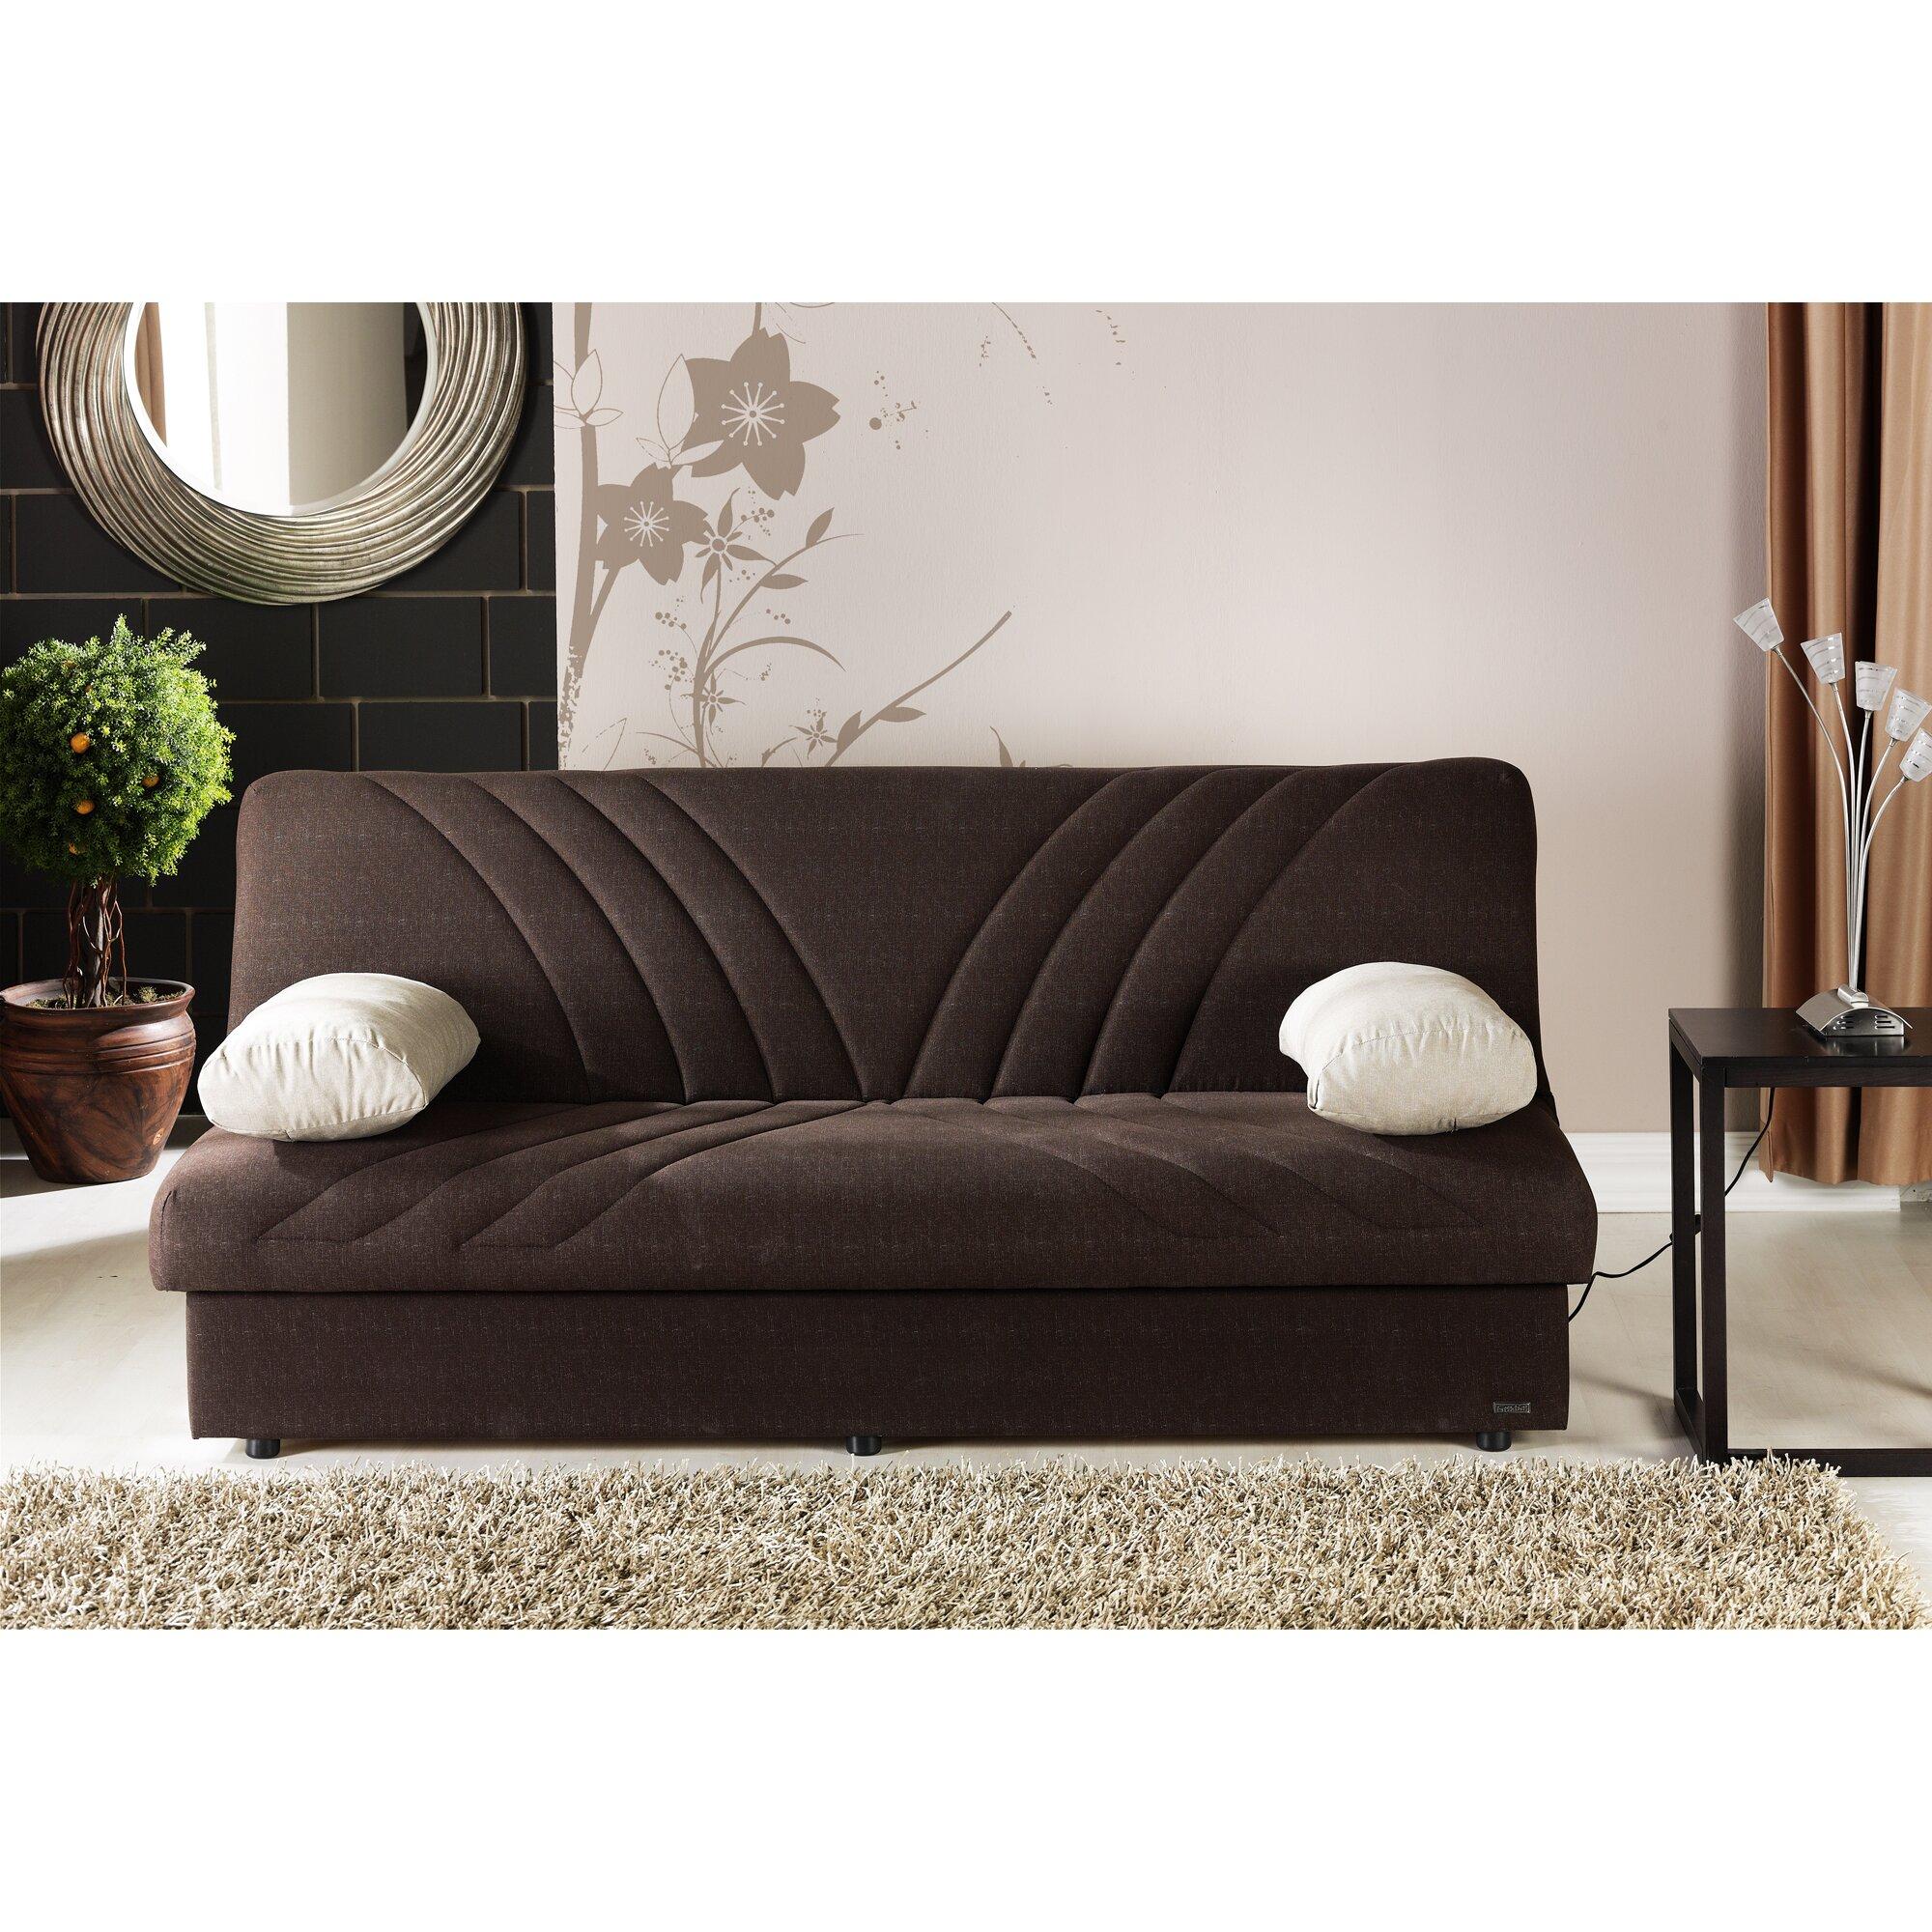 brayden studio carwile three seat sleeper sofa reviews wayfair